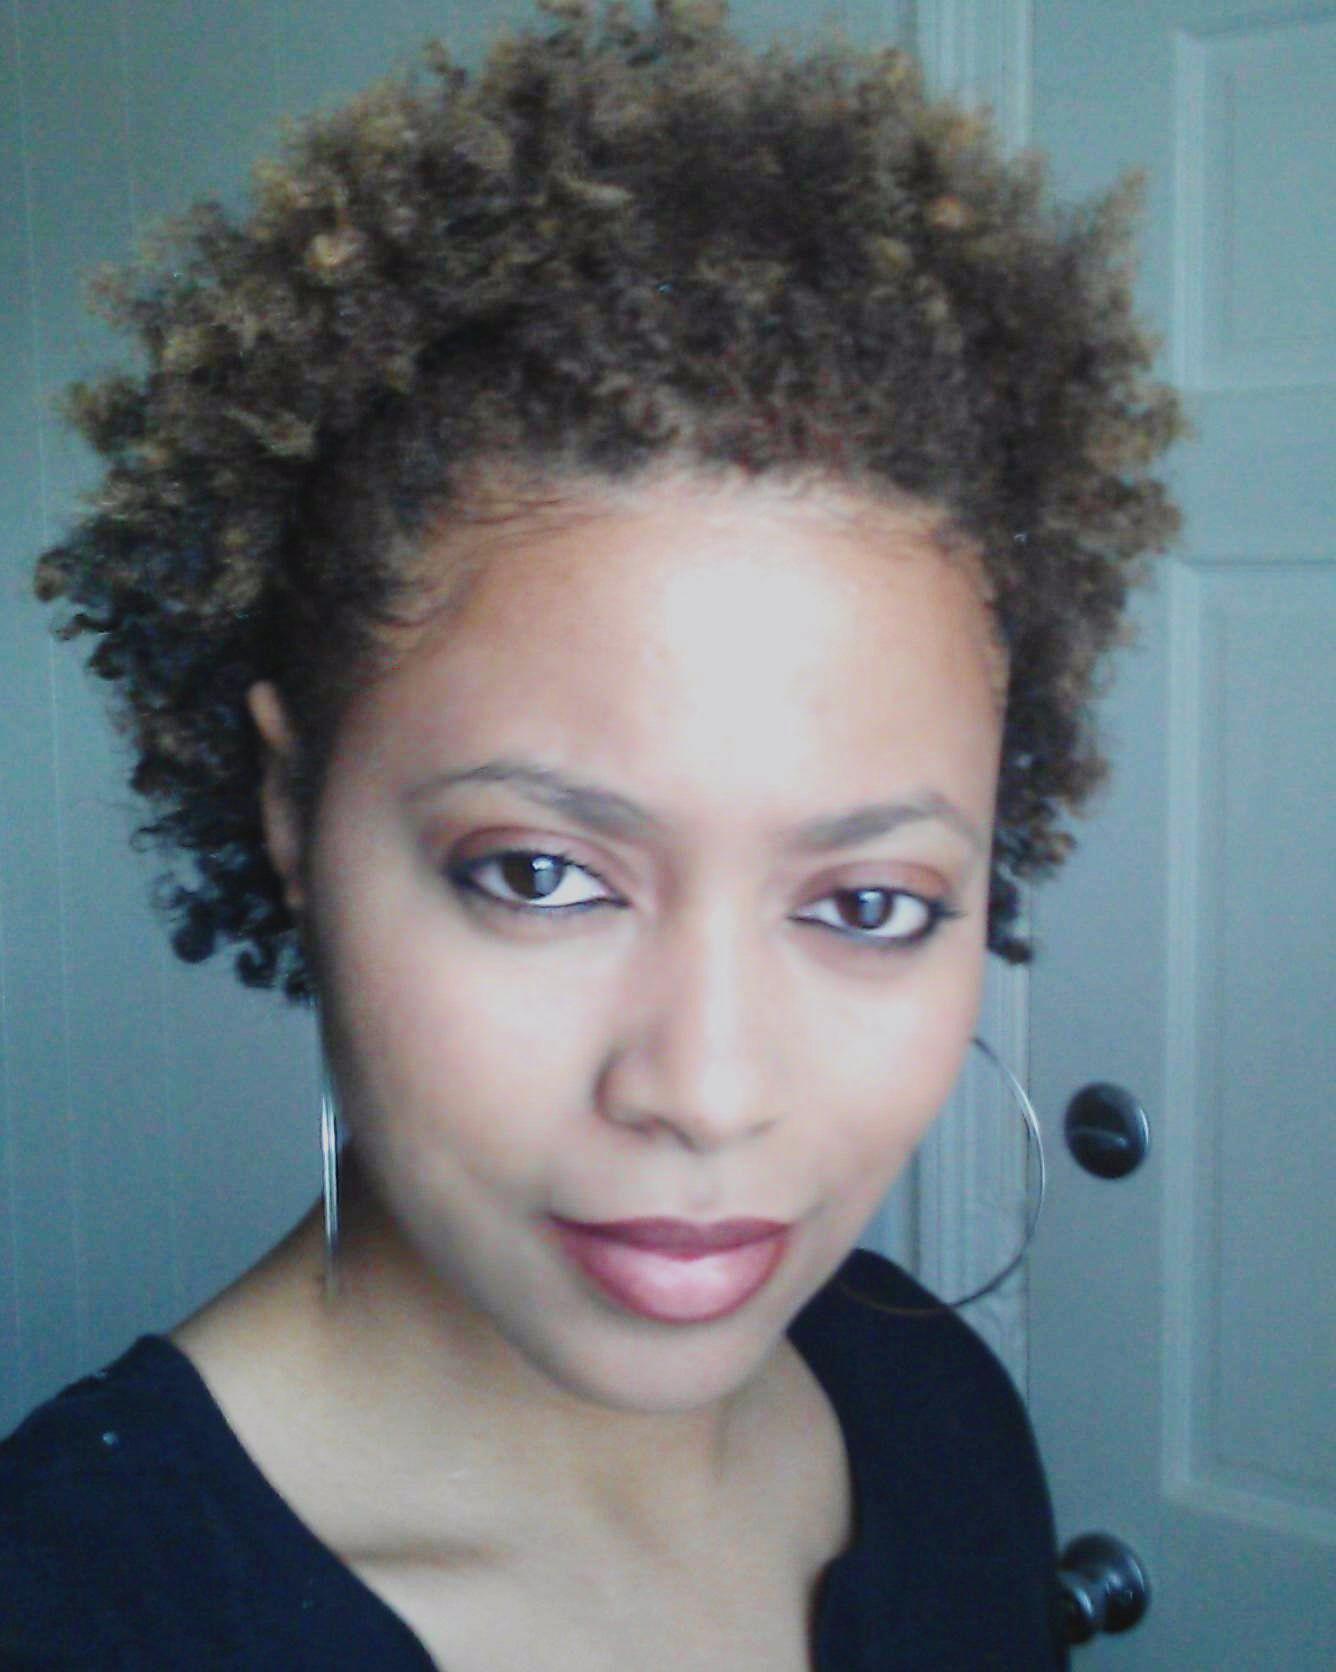 Natural Hair Styles Twa Black Women Natural Beauty 4b C Hair Afro Natural Hair Styles For Black Women Hair Styles Natural Hair Styles